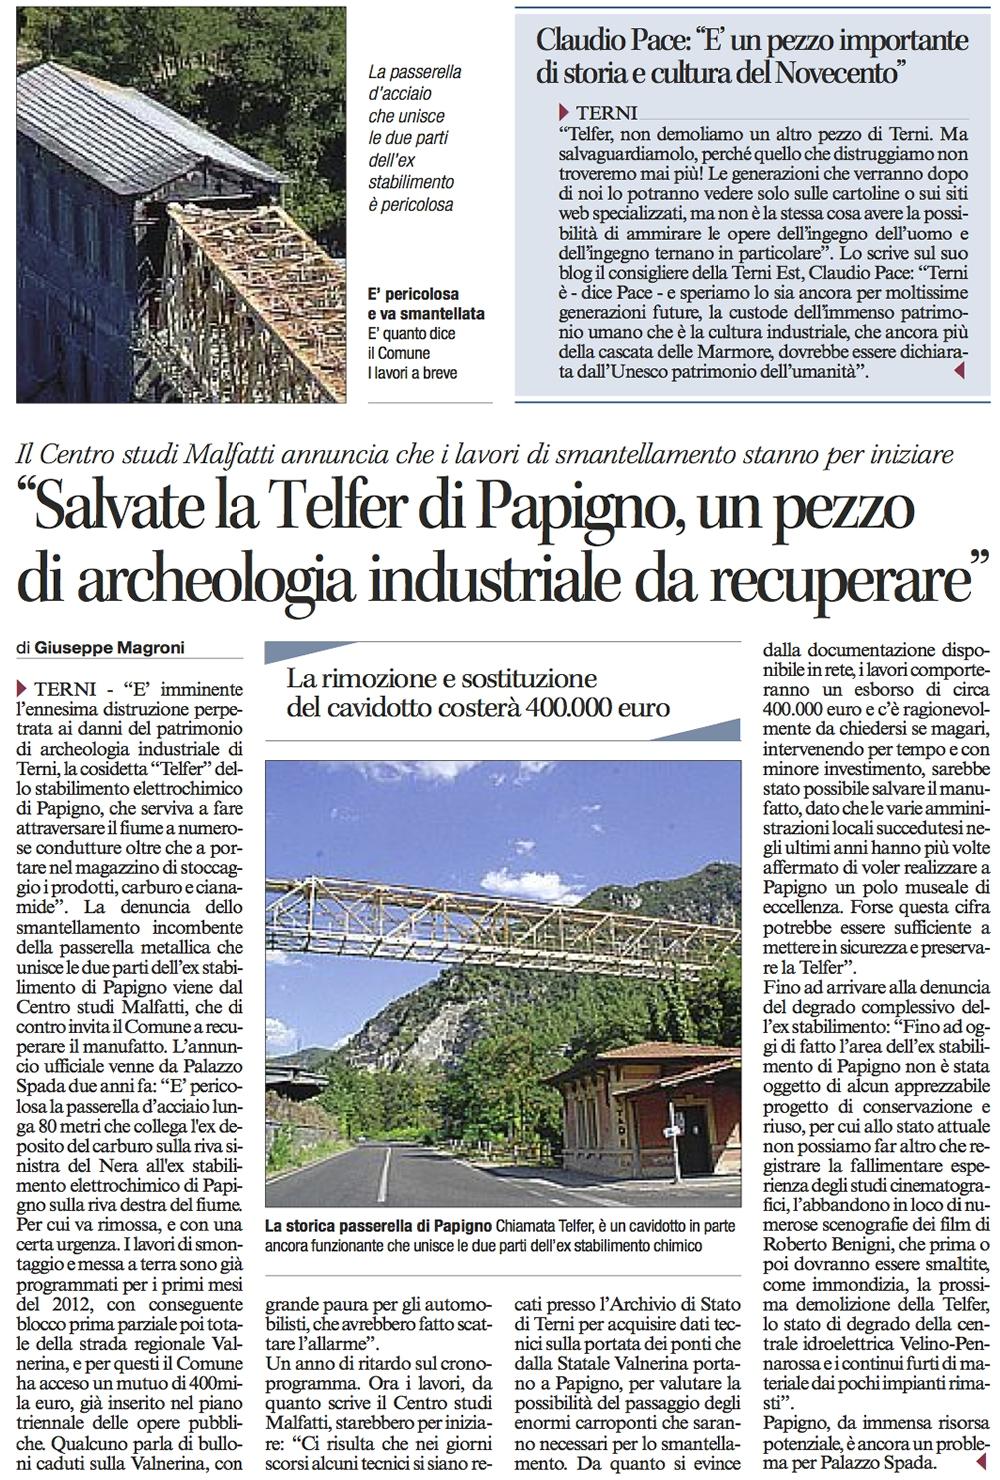 Corriere dell'Umbria, p. 34